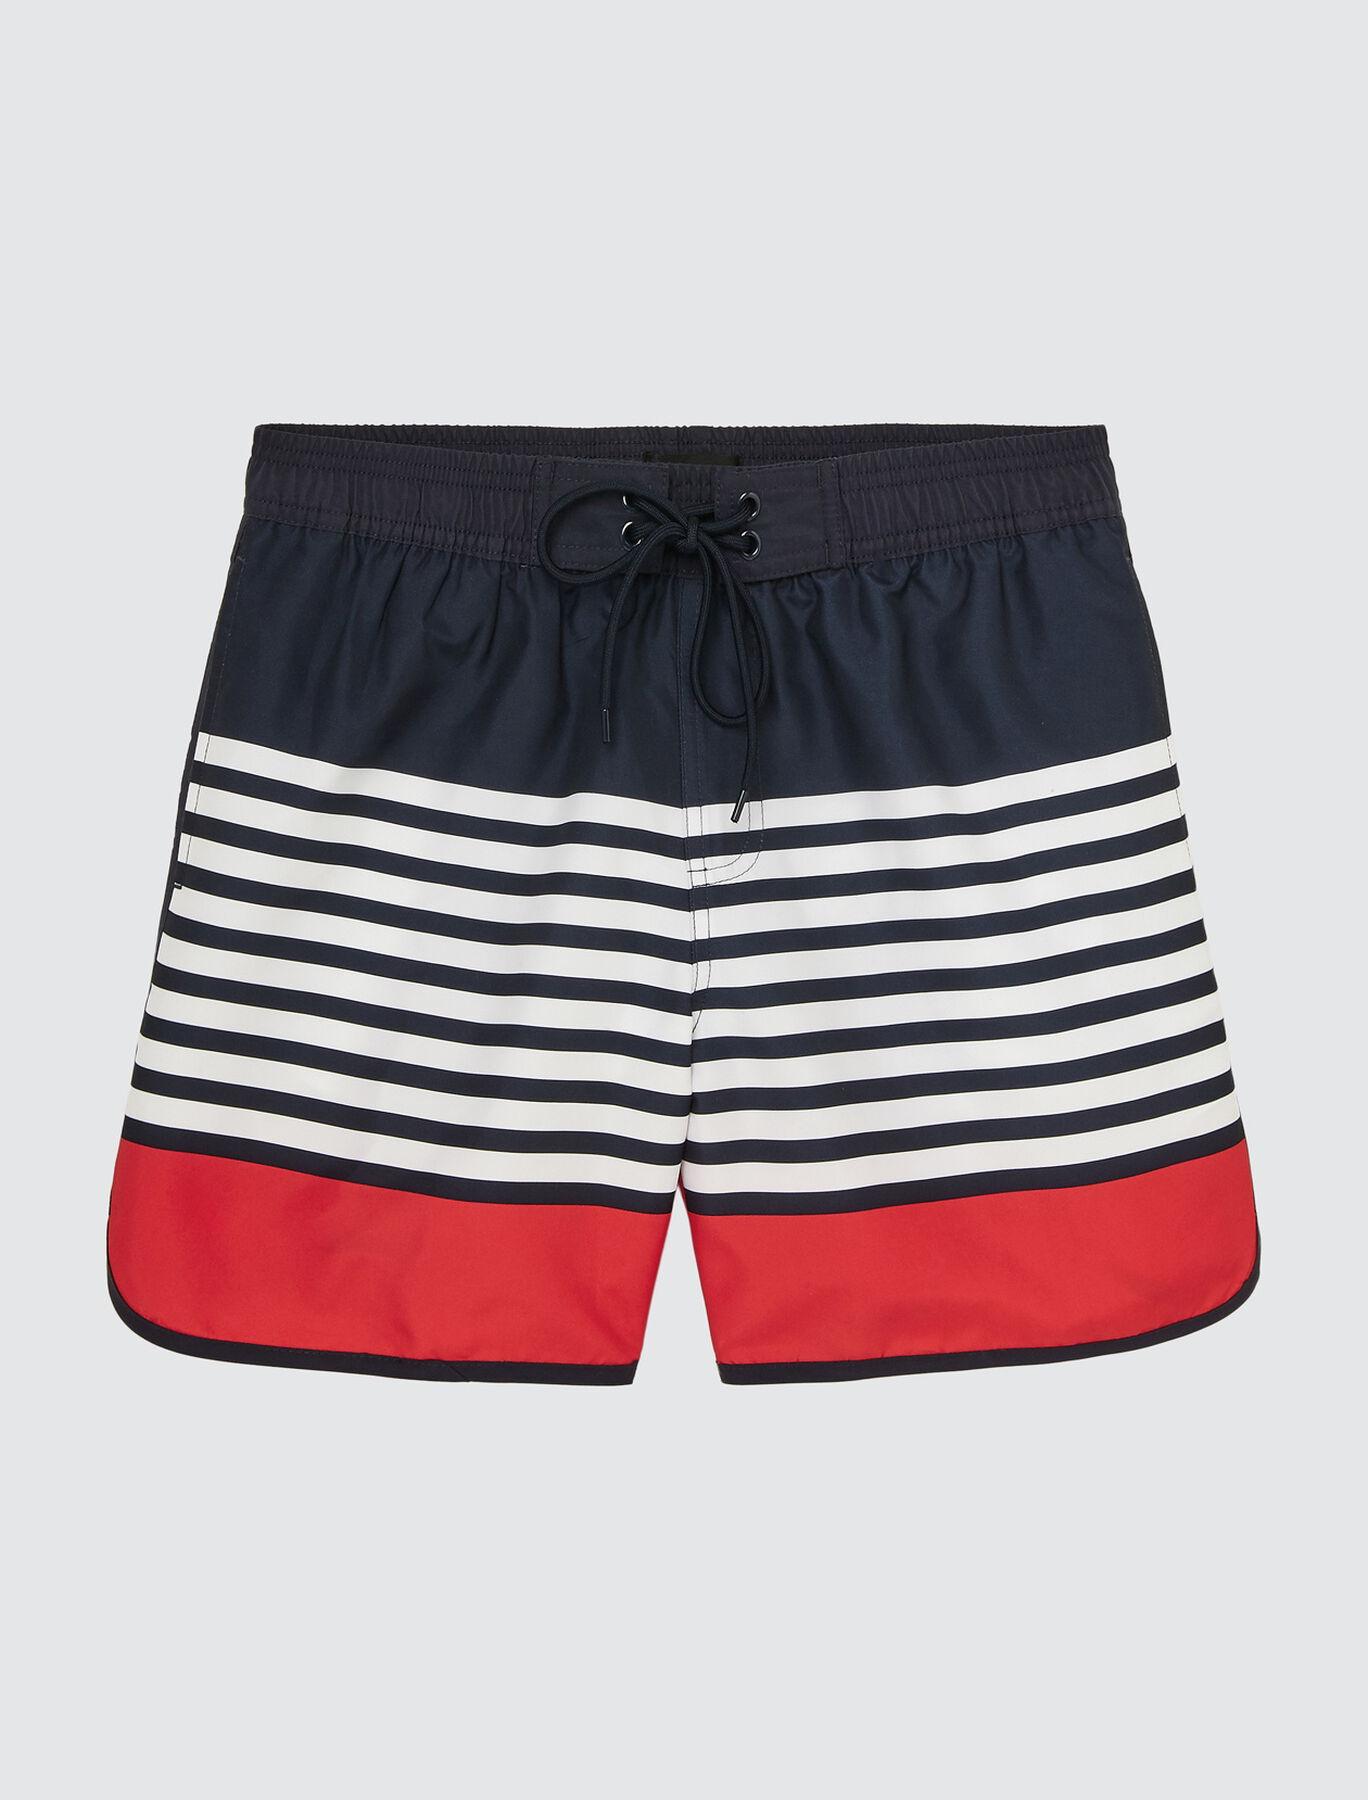 Short de bain mi-long marinière colorblock